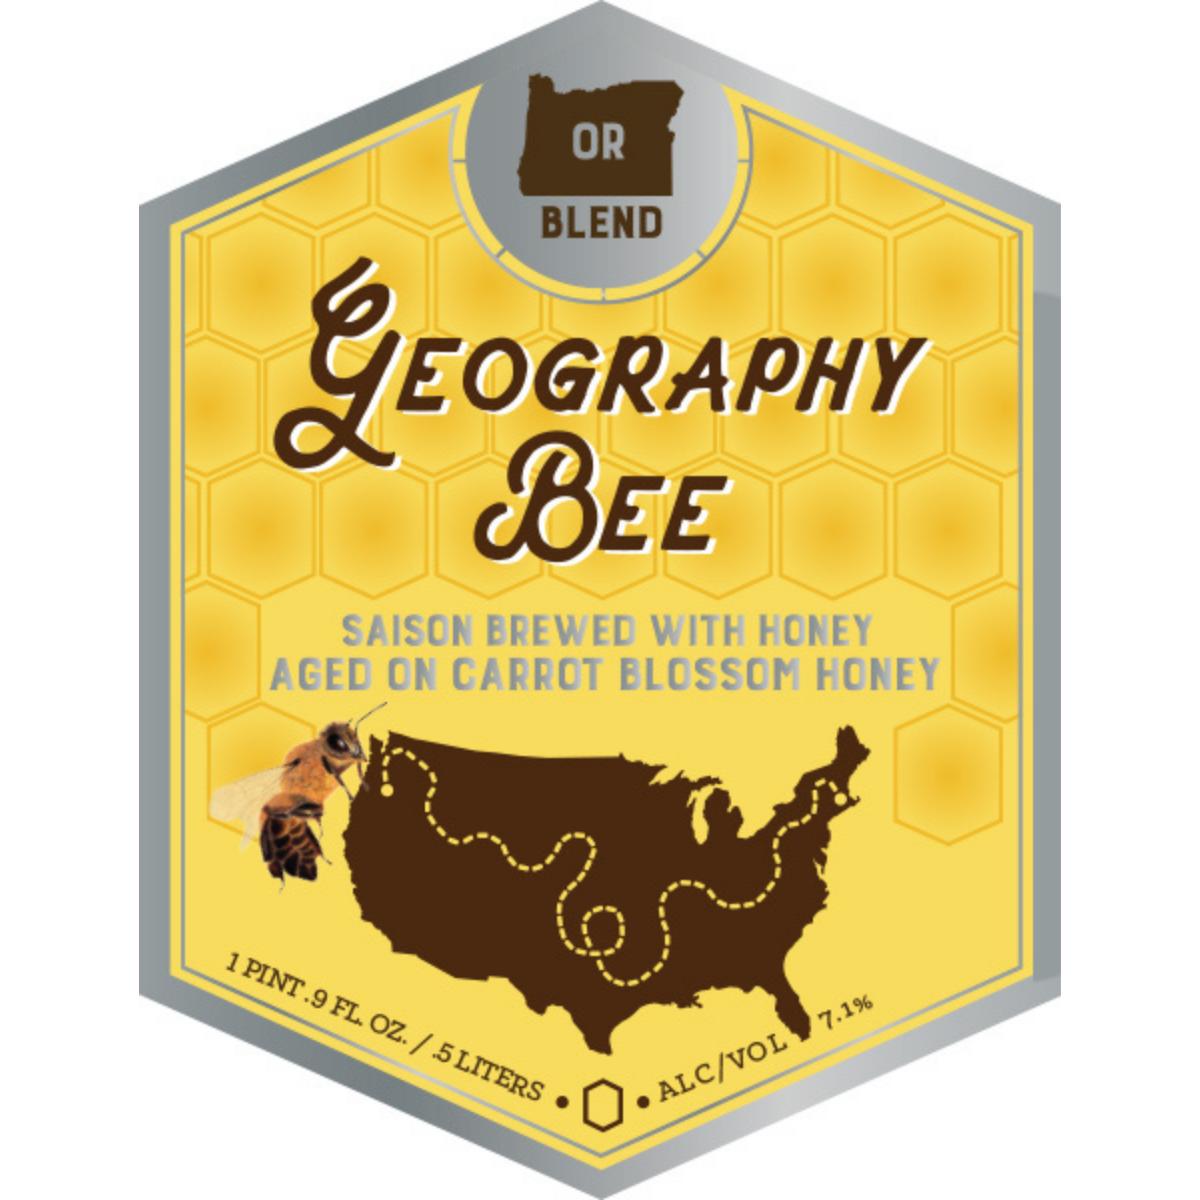 Jack's Abby/ Springdale Beer/ Nectar Creek Geography Bee- Oregon Blend